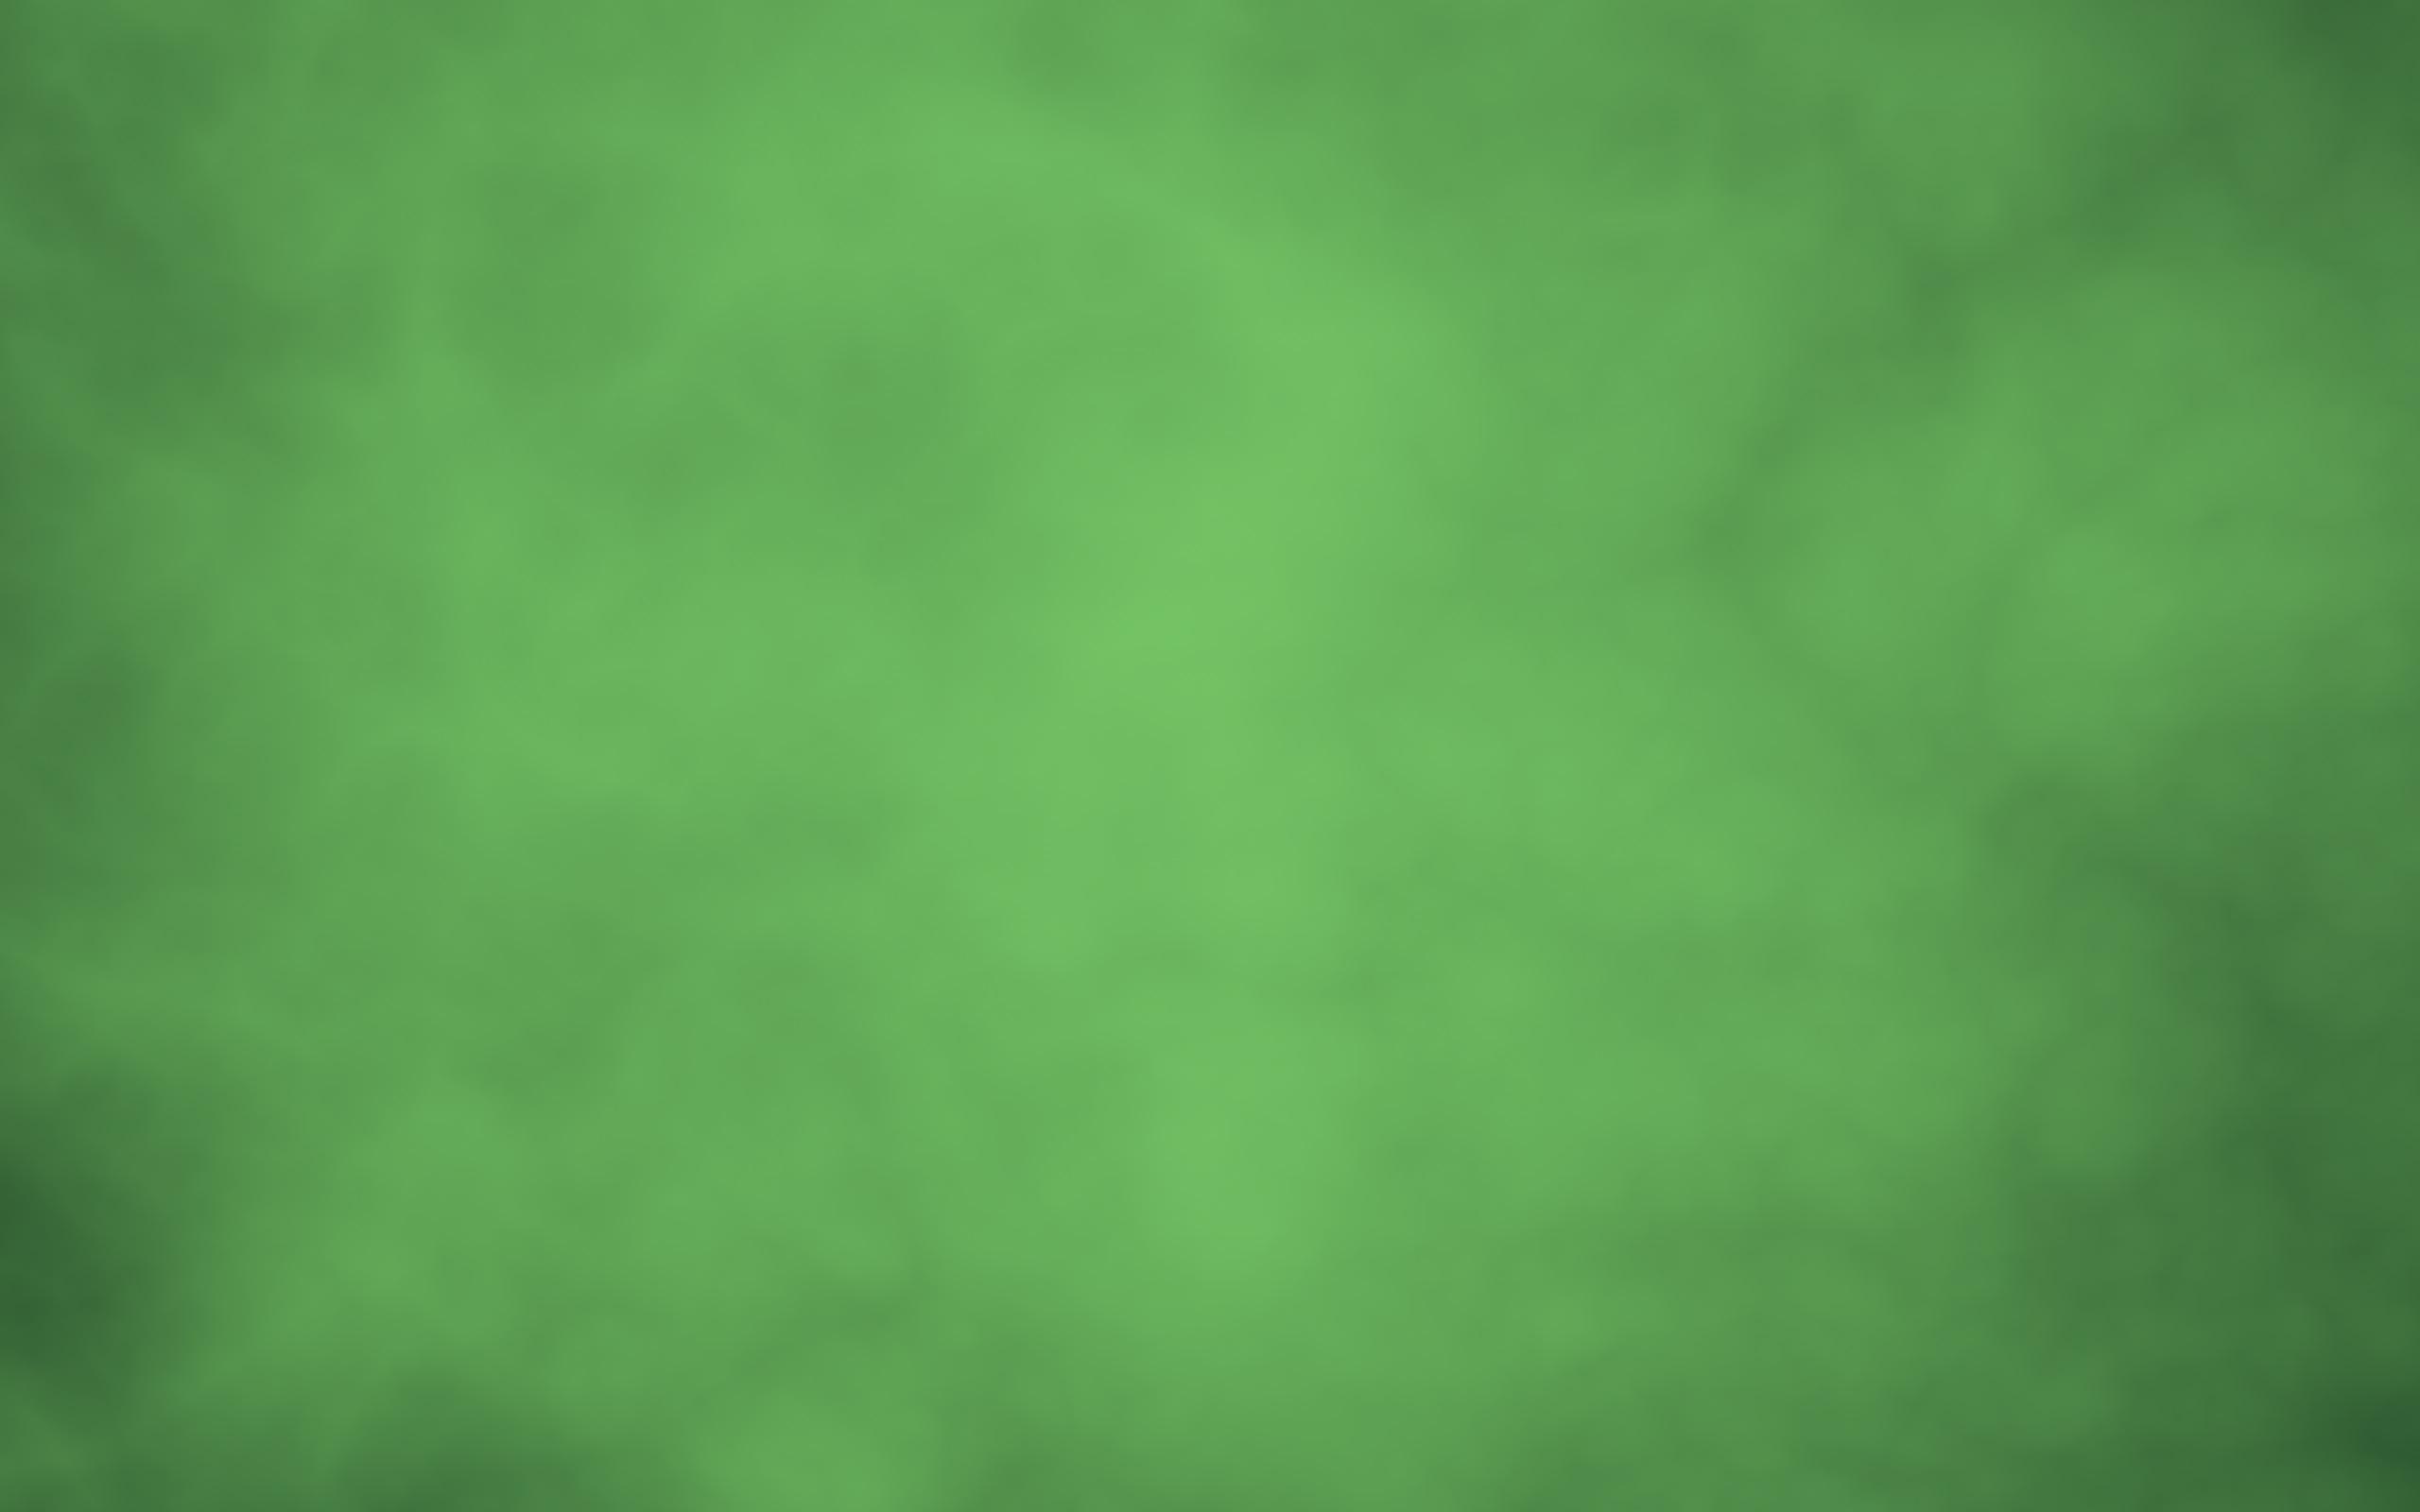 Green cloudy backdrop photo